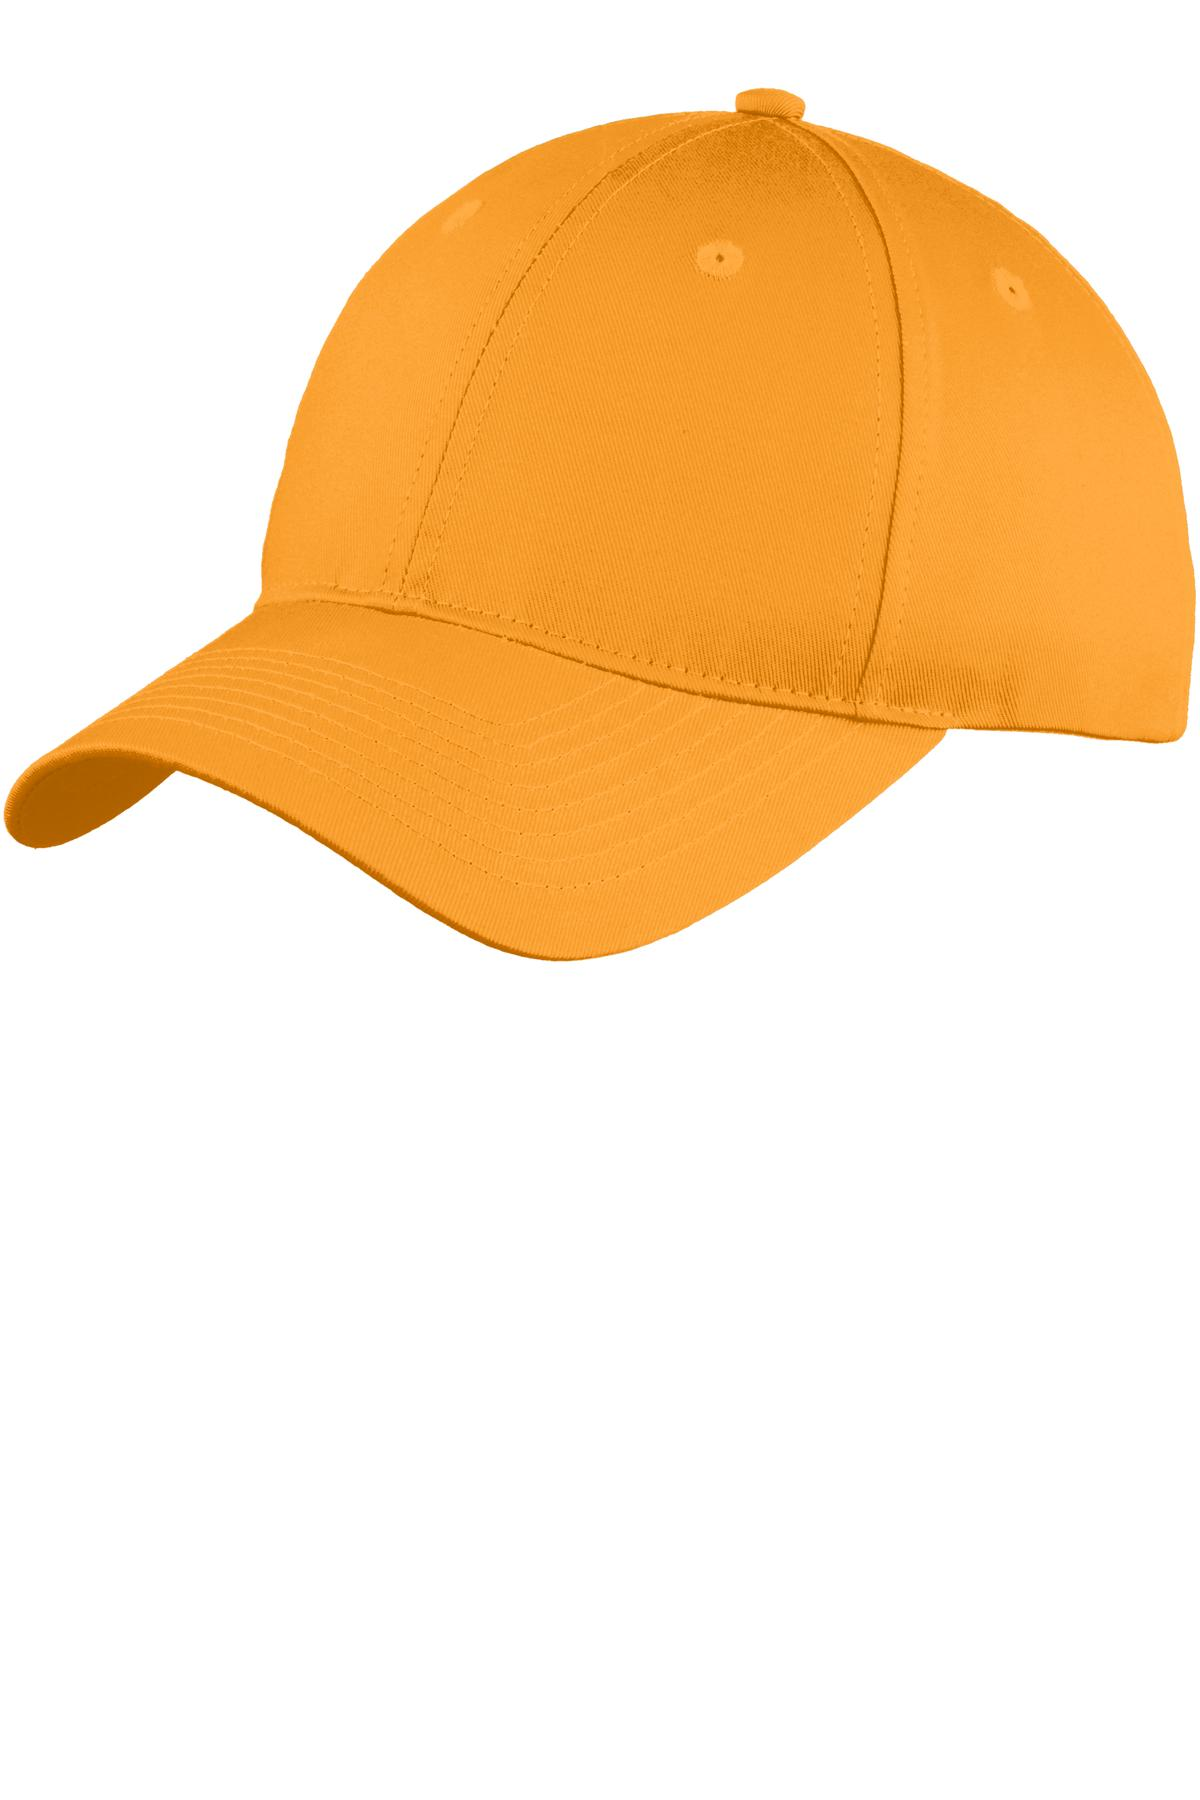 Port & Company® C914 - Six-Panel Unstructured Twill Cap